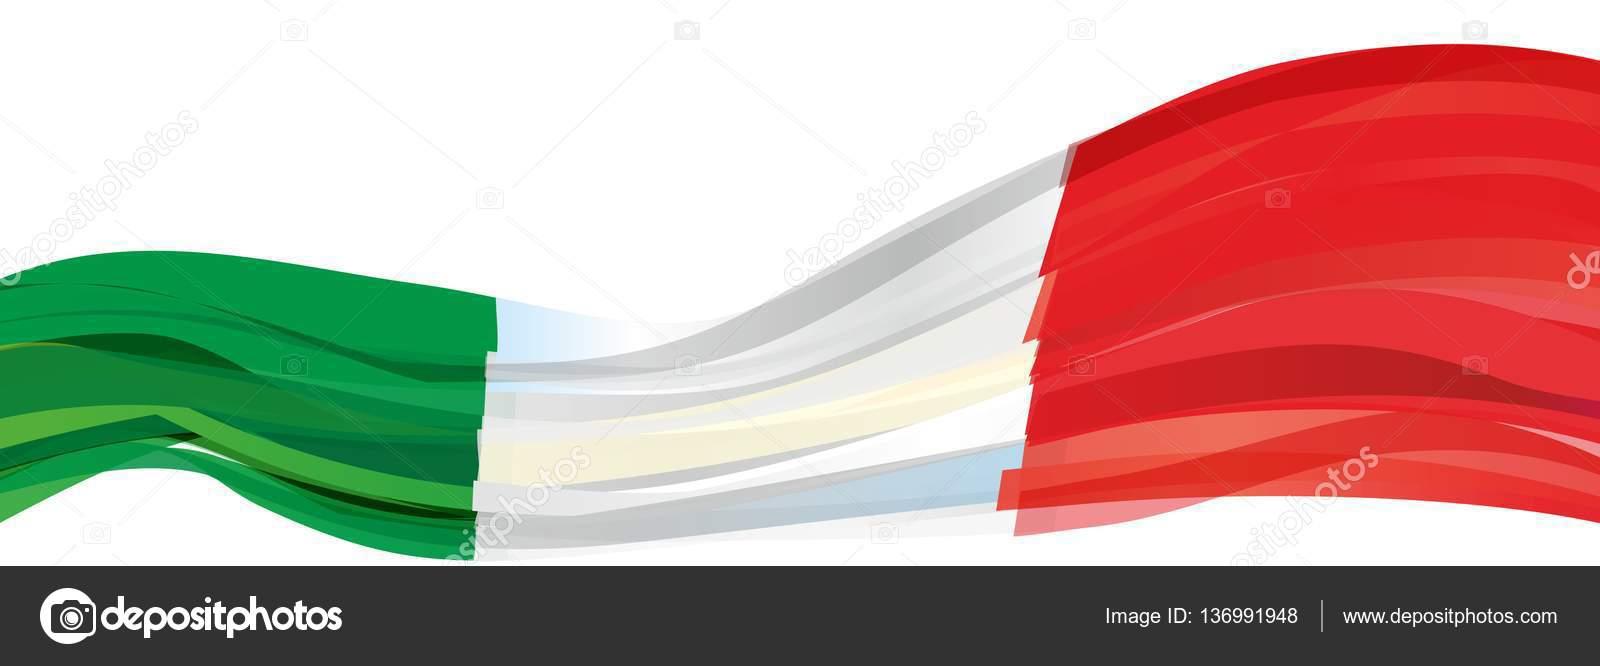 Green White Red Flag Italy Stock Photo C Salivit 136991948